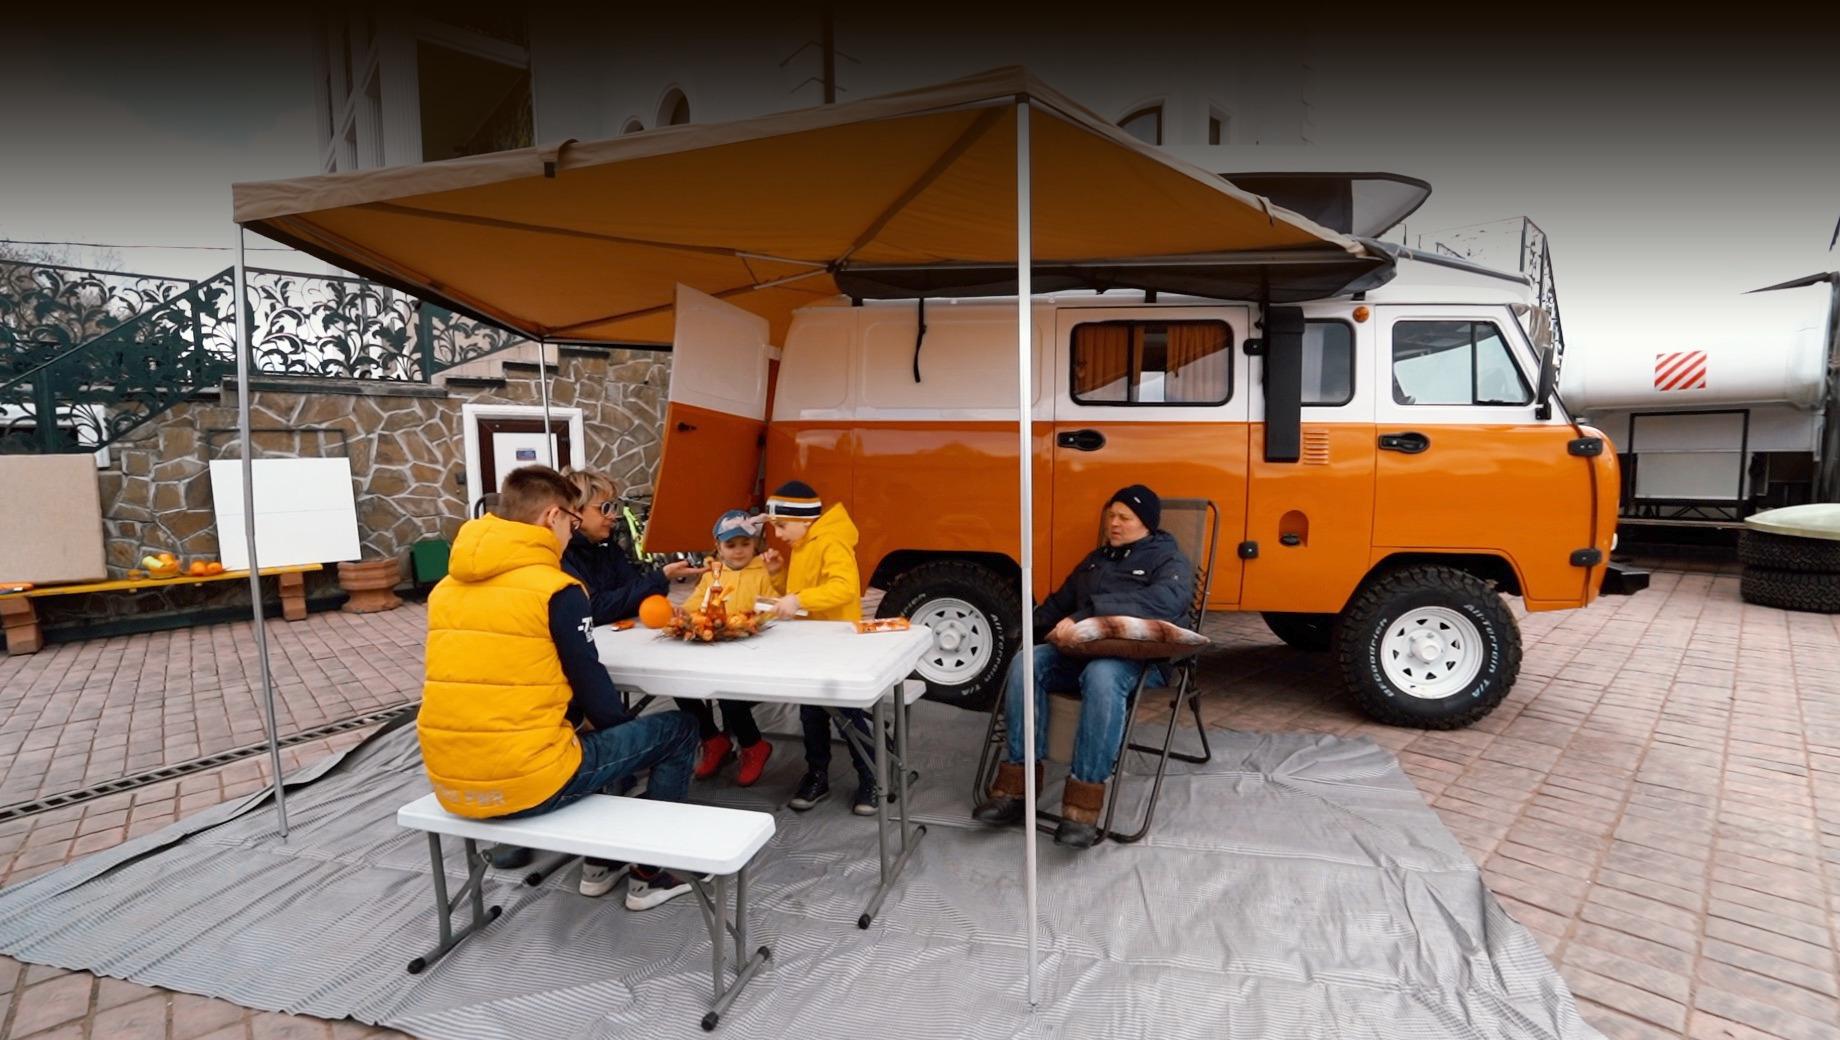 Кемпер УАЗ «Байкал» предложен с большим набором опций